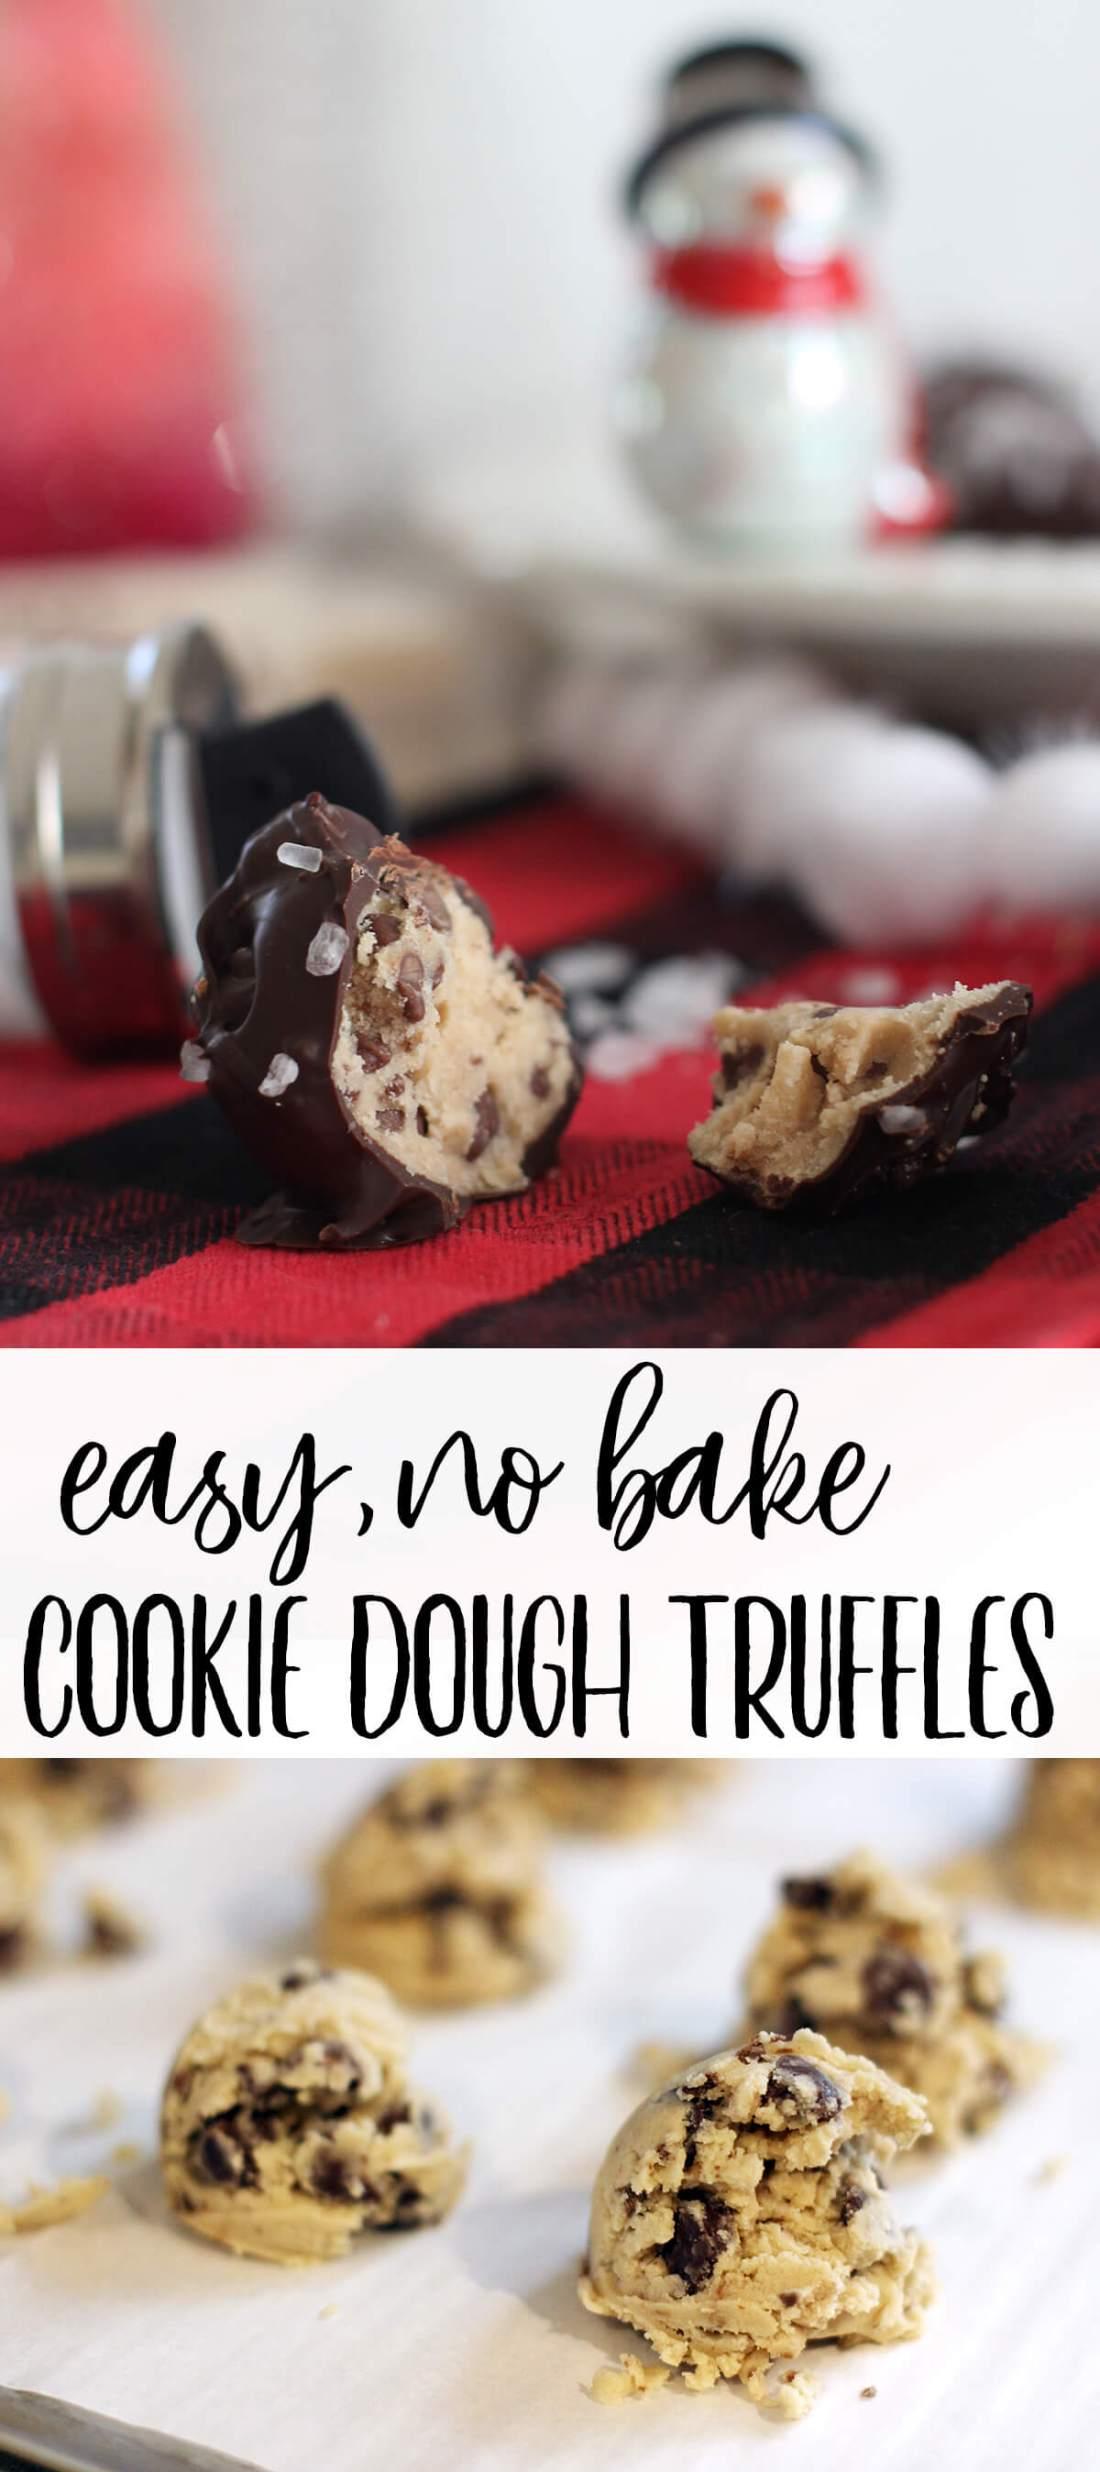 Easy, No Bake, Chocolate Chip Cookie Dough Truffles